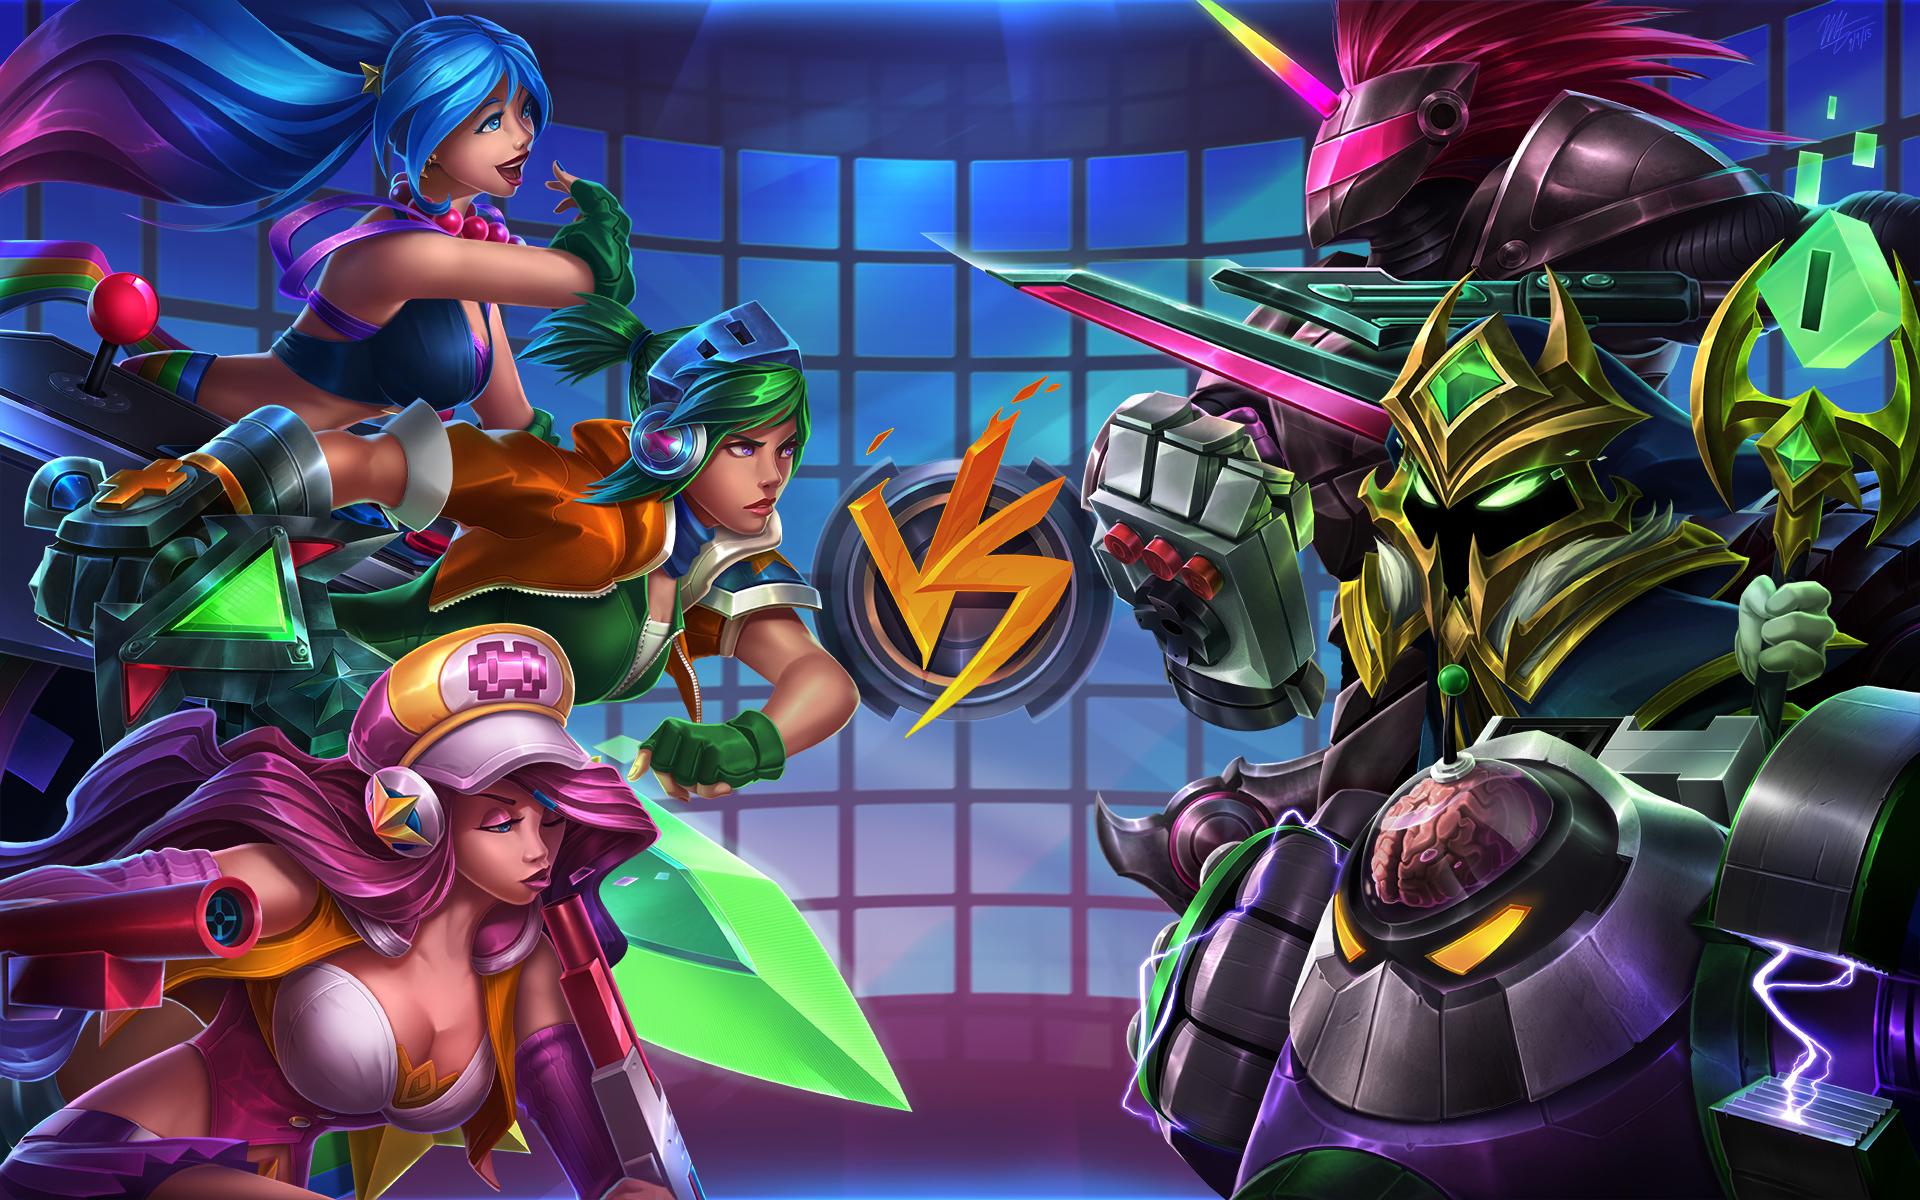 Lol Wallpapers: League Of Legends Arcade Wallpaper